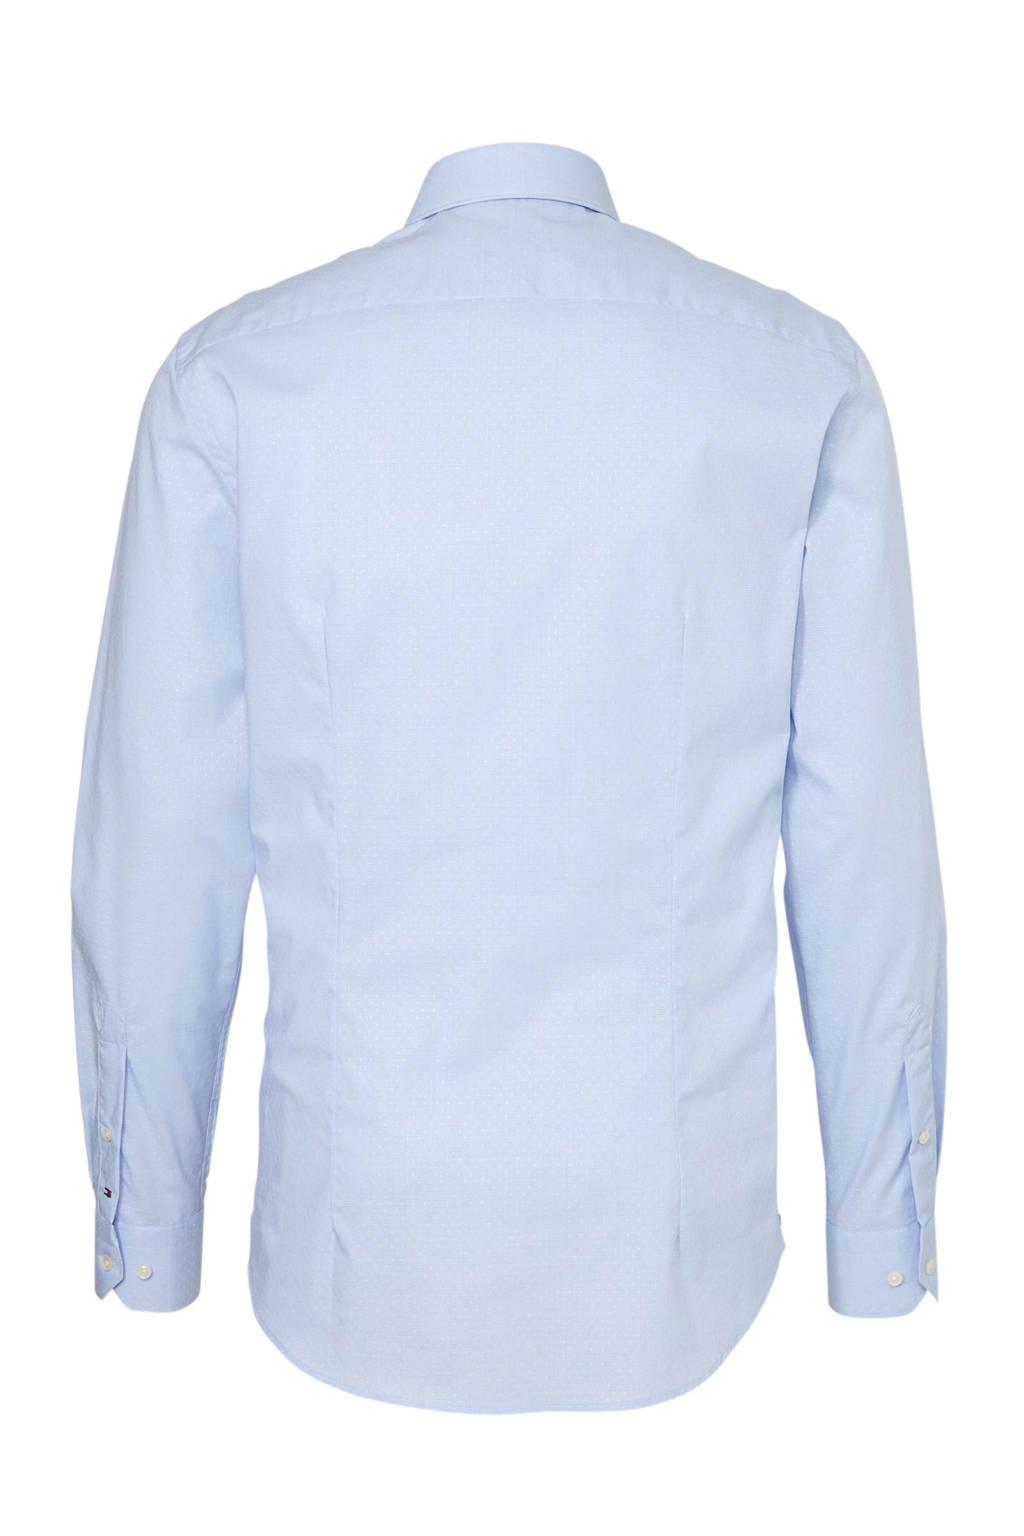 9bf9d50351e Tommy Hilfiger Tailored slim fit overhemd met print blauw   wehkamp